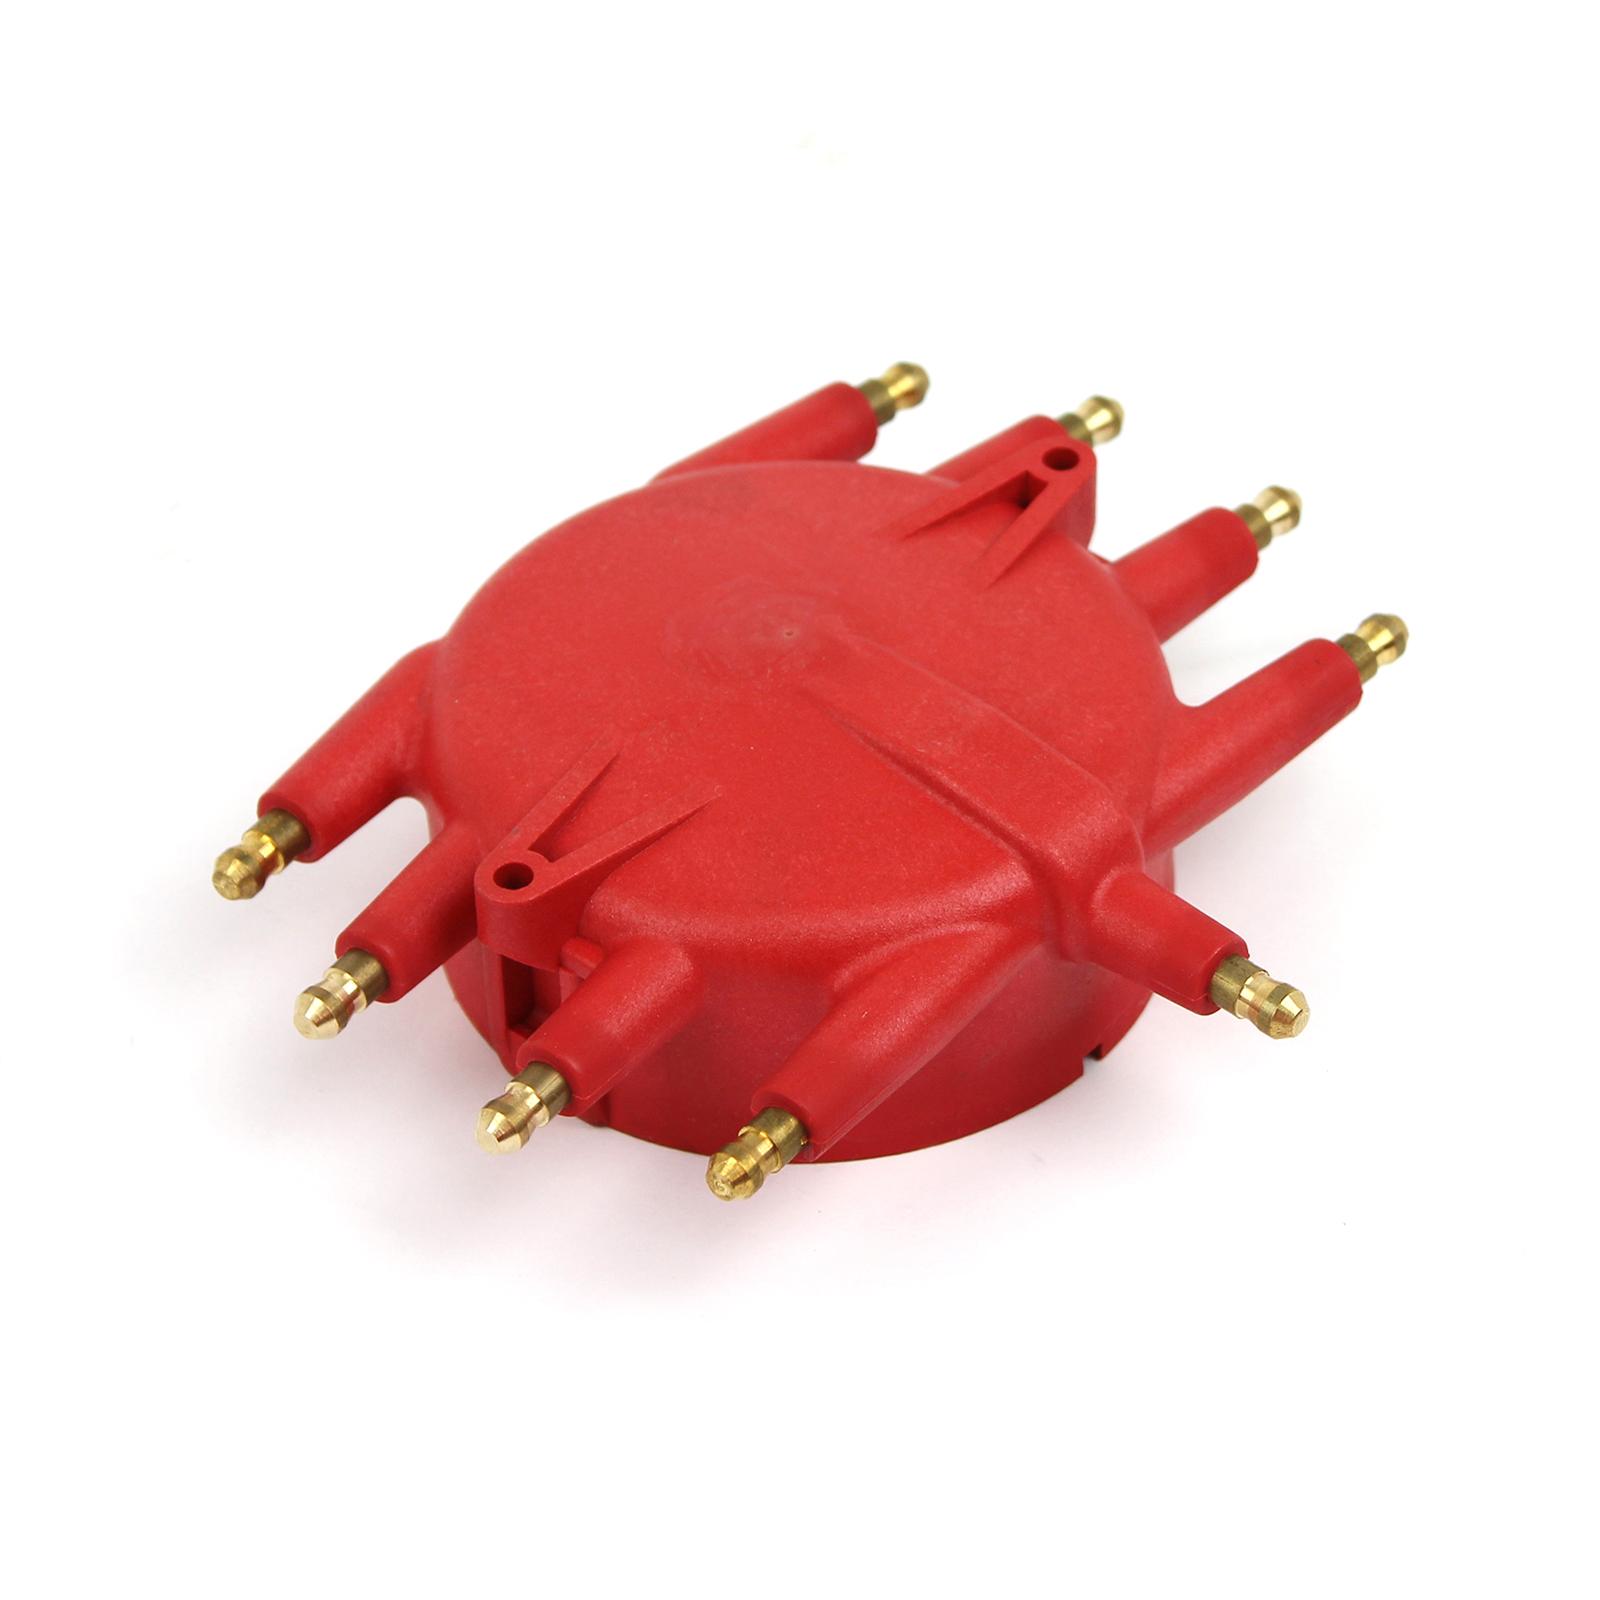 Male/HEI Screw-Down Flathead Crab Distributor Cap - Red